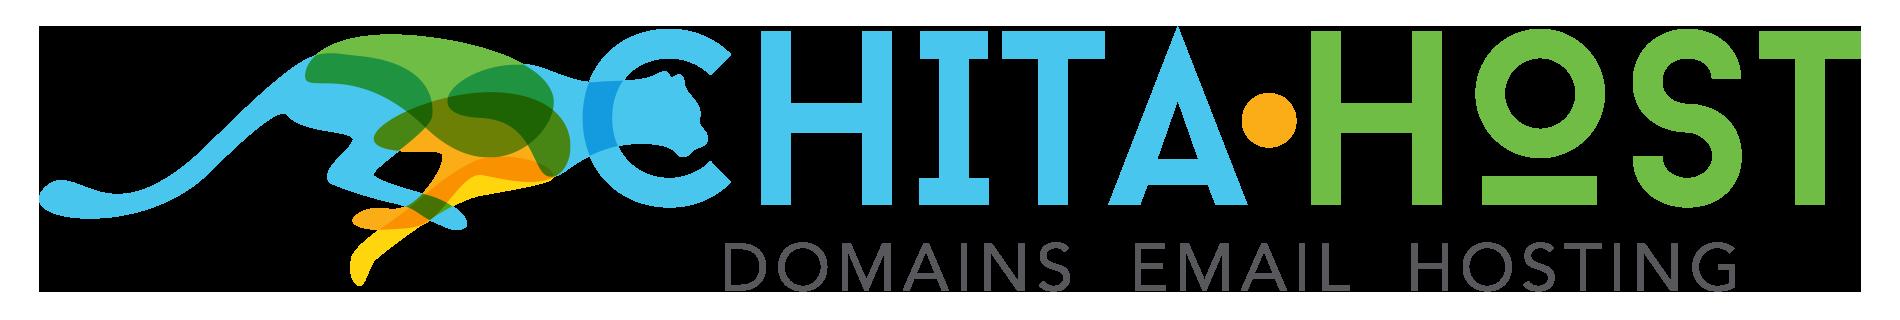 Chita Host - Domains, Email, Hosting